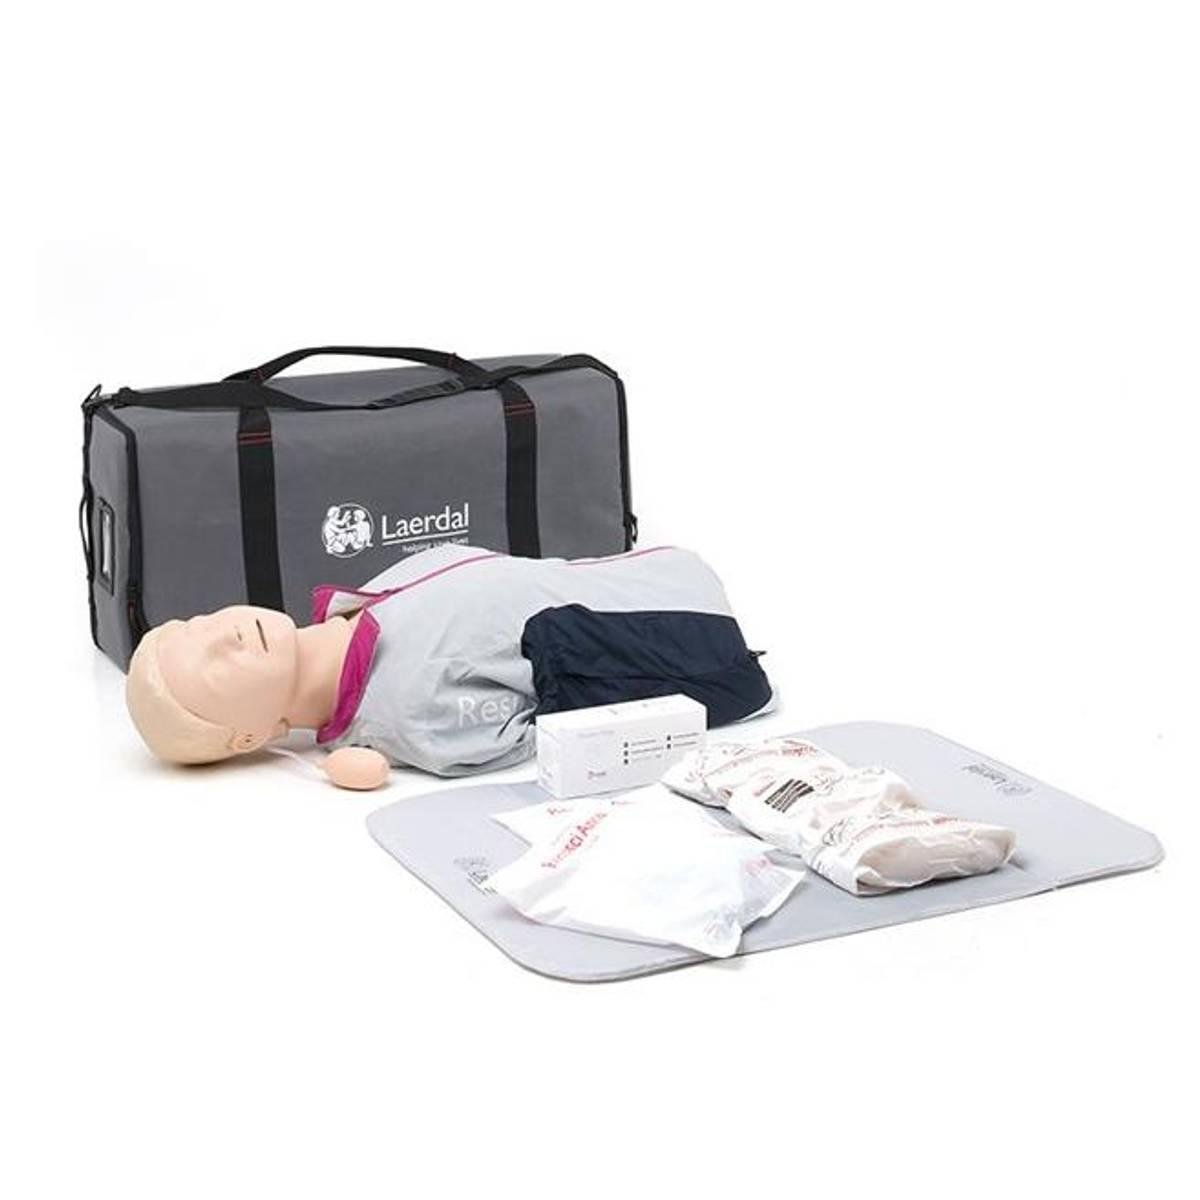 Resusci Anne First Aid Torso